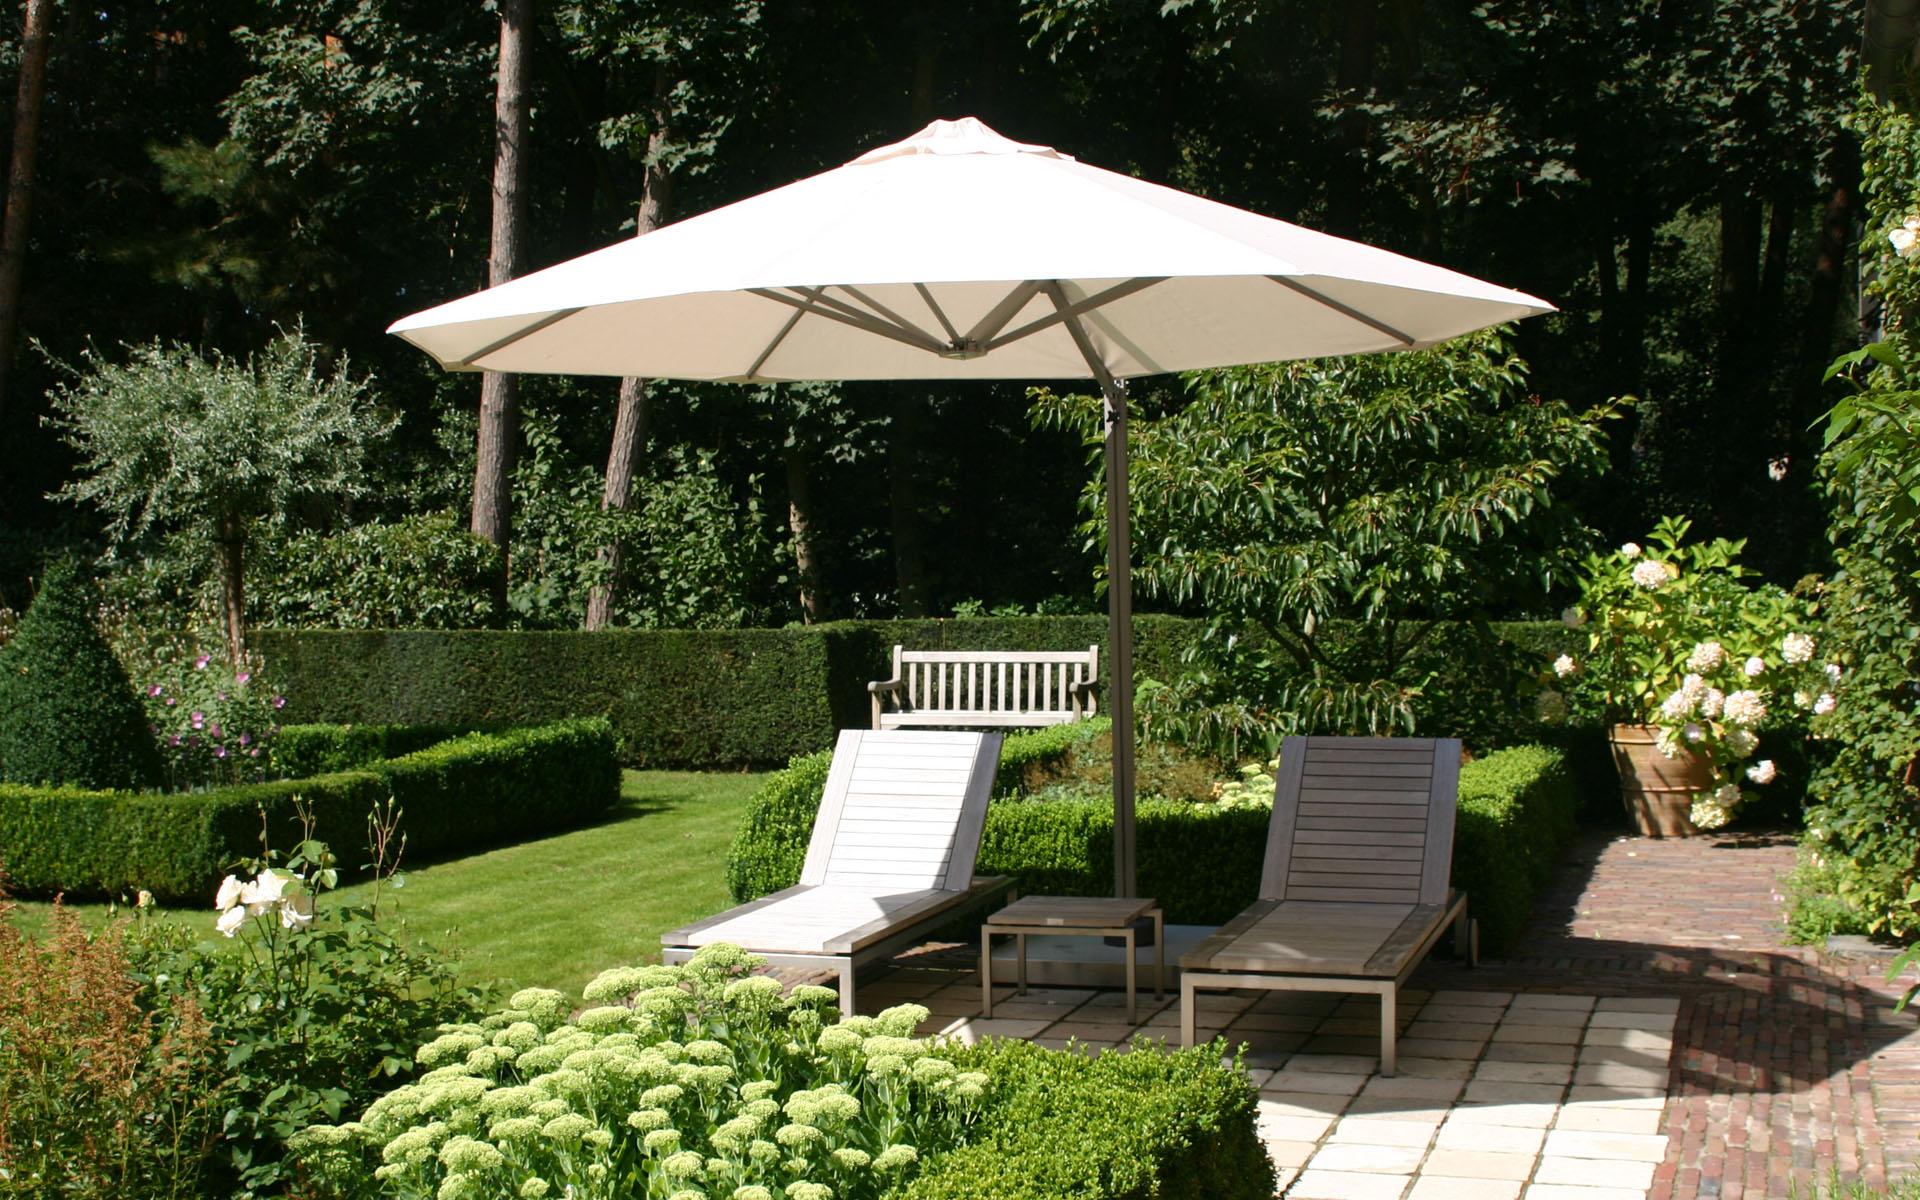 Gartenzelt 3 4 M : Parasols xl luxe tuin horeca